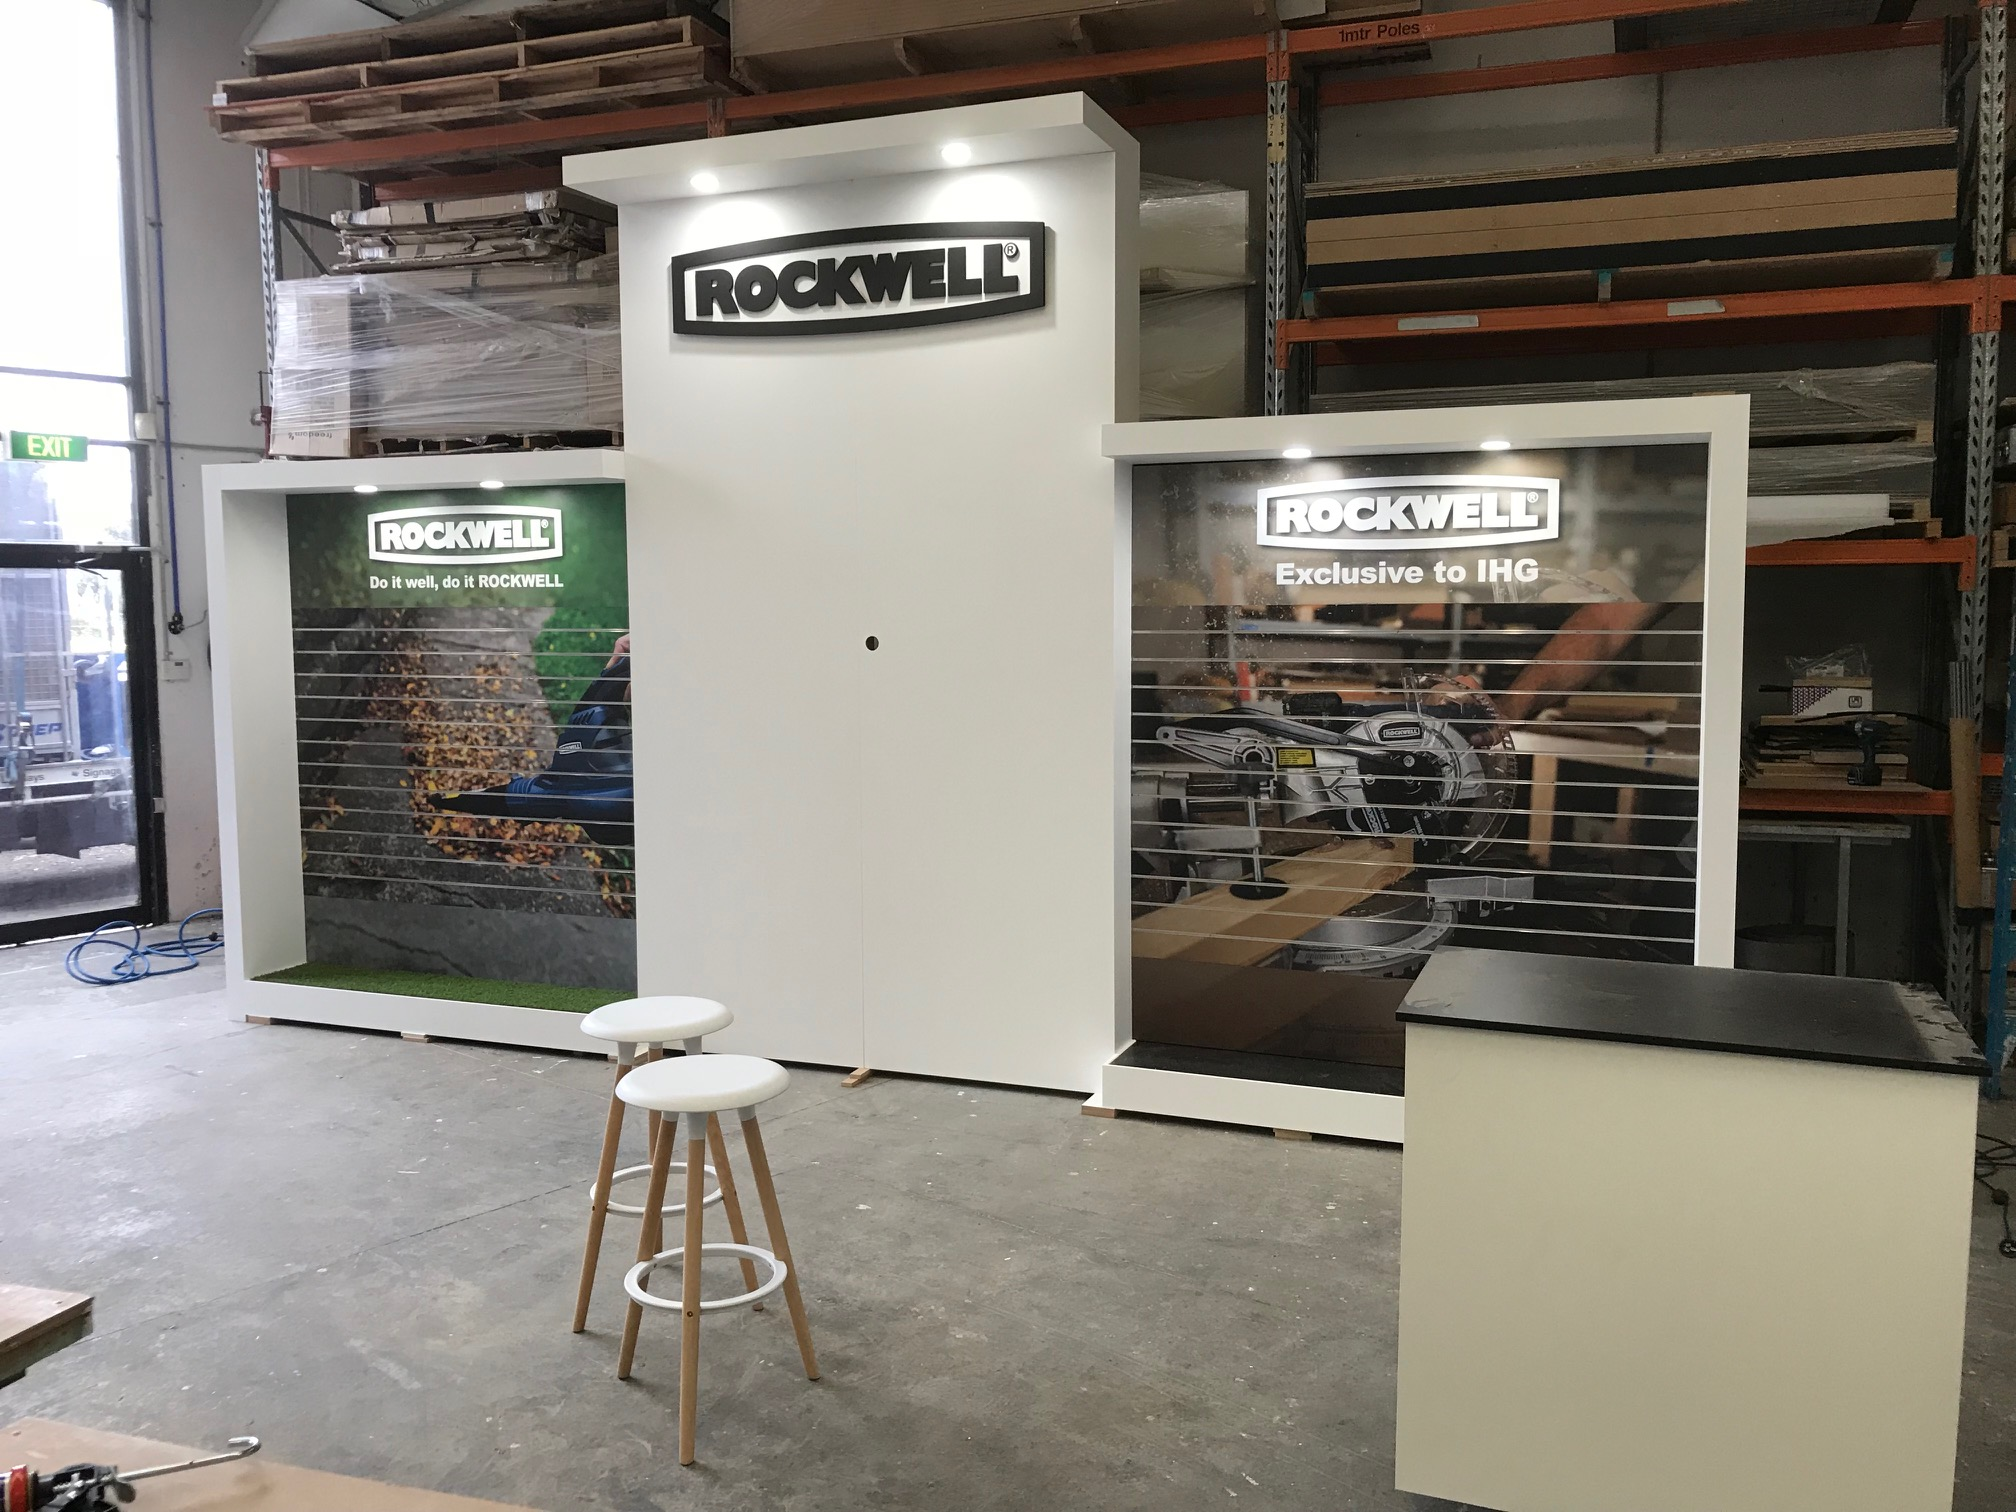 Rockwell Display w my photos.jpg